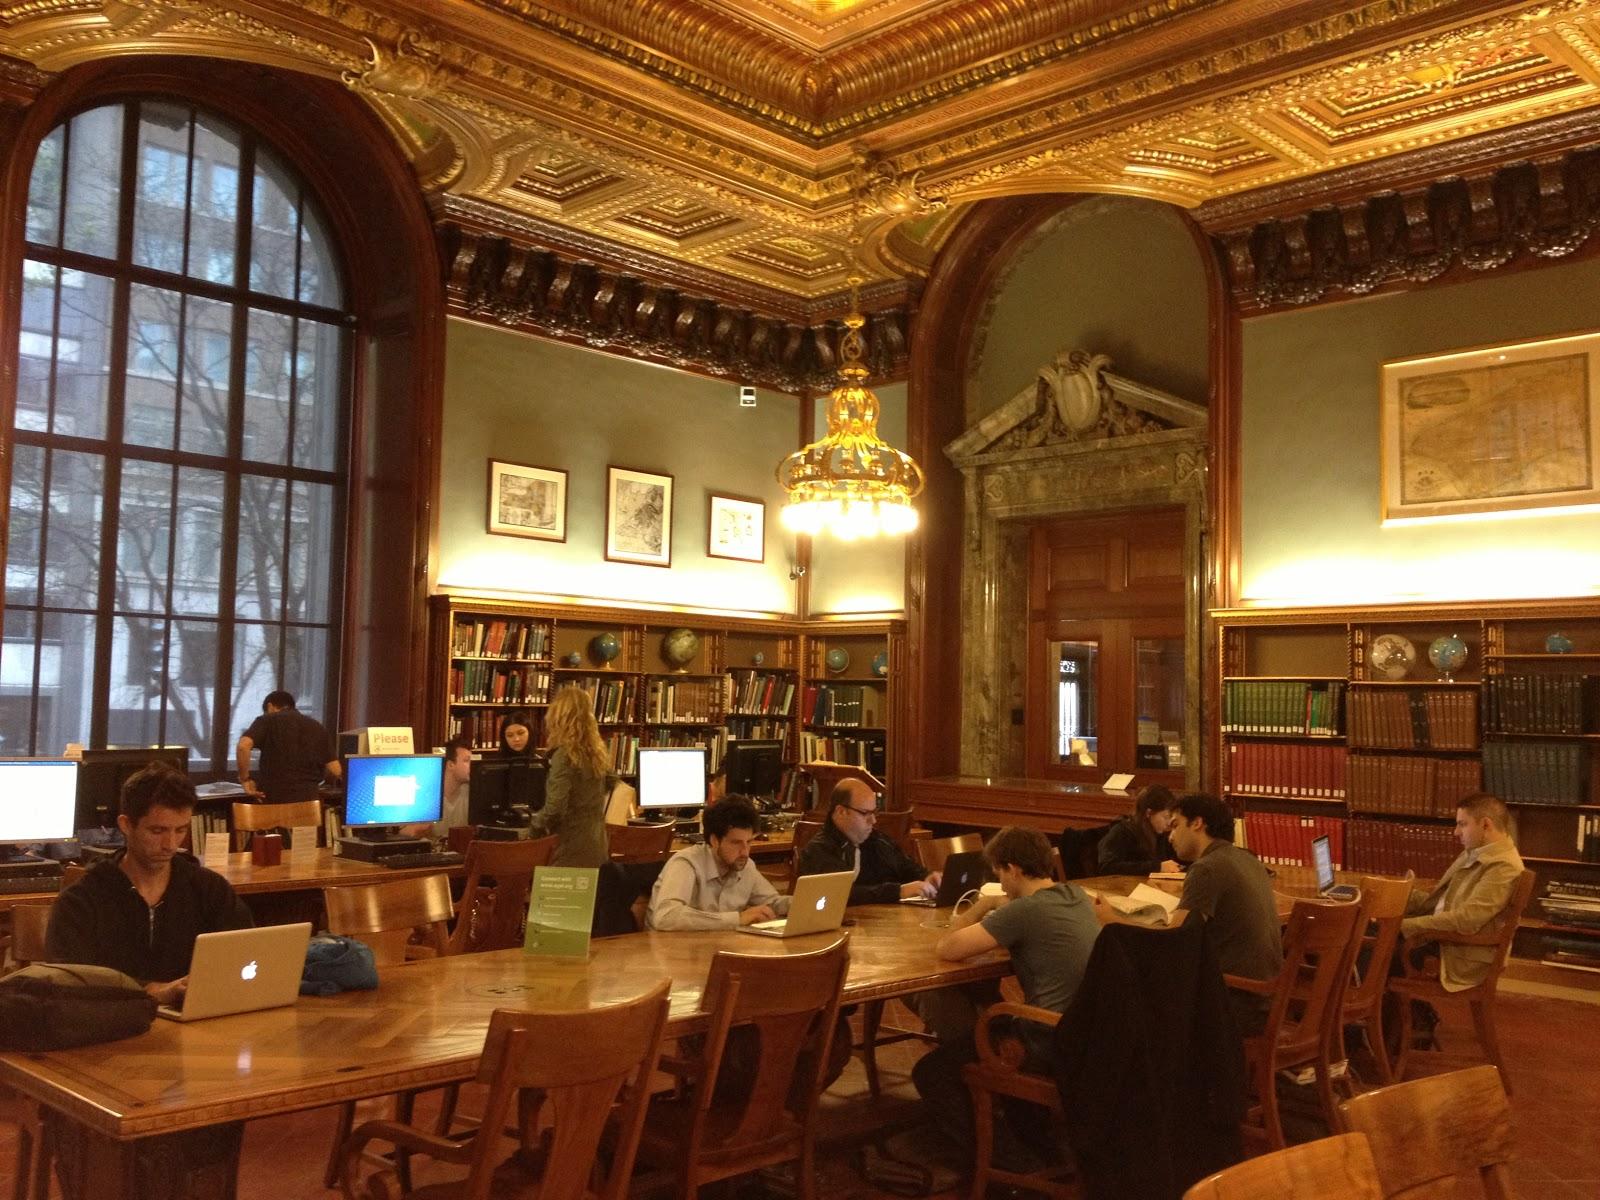 Sindoe's NYC : 29/4/13 – New York Public Library and Robert